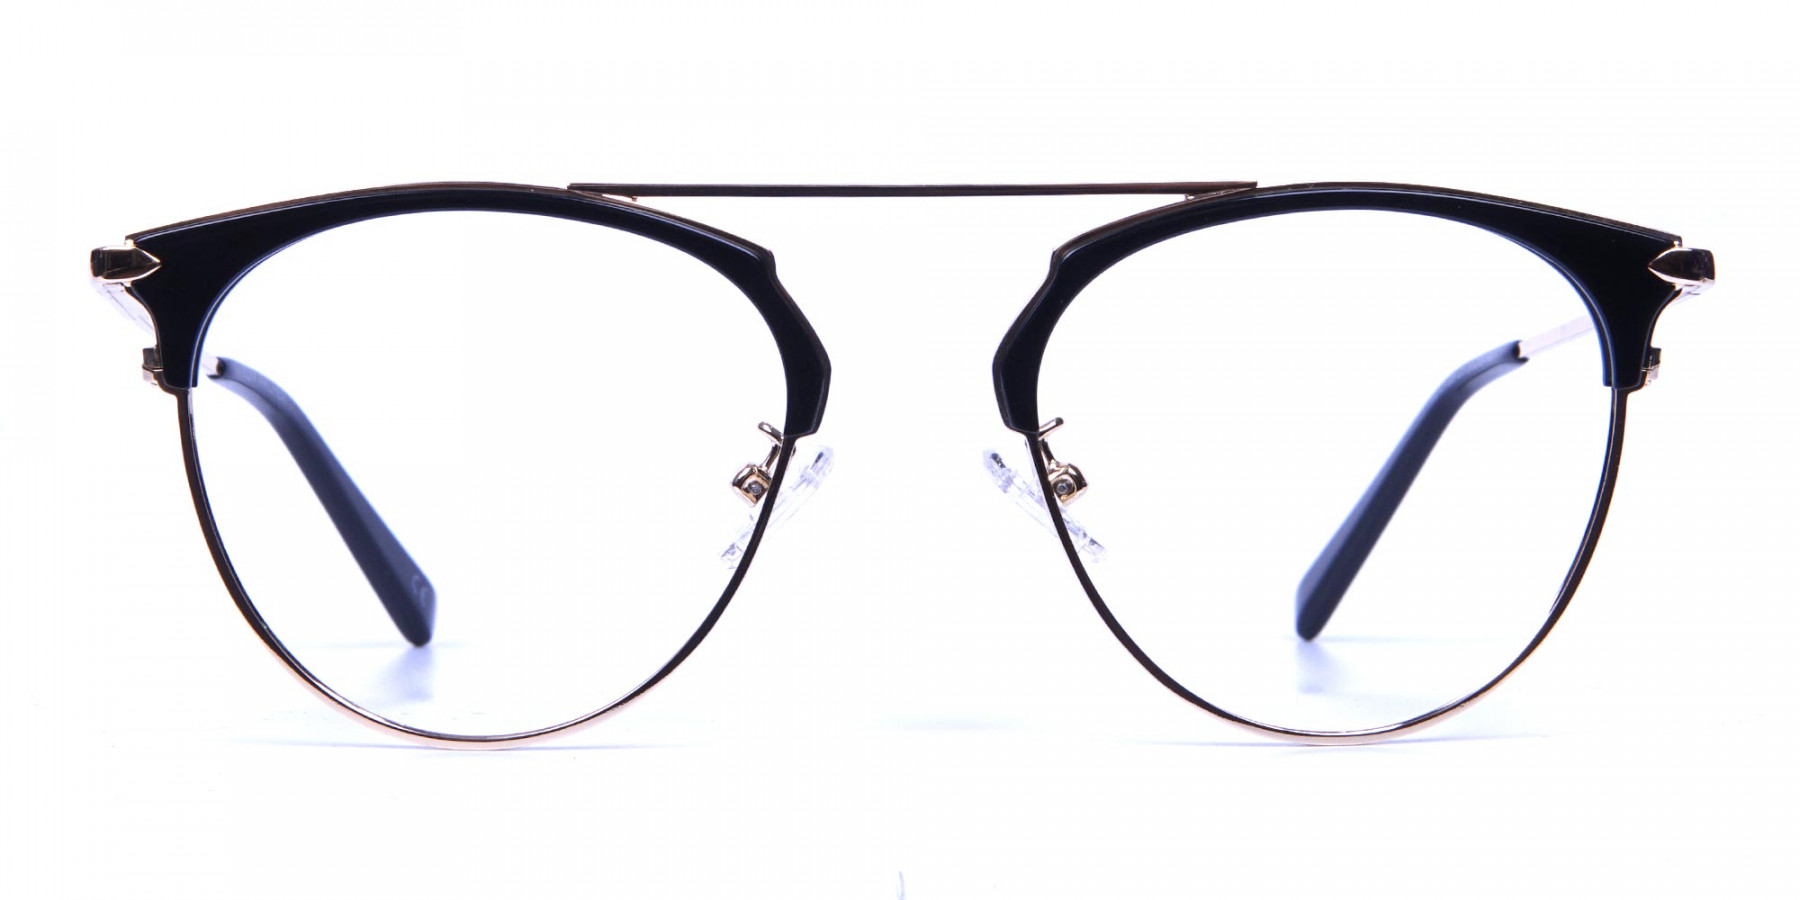 Black and Gold No-Nose Bridged Glasses